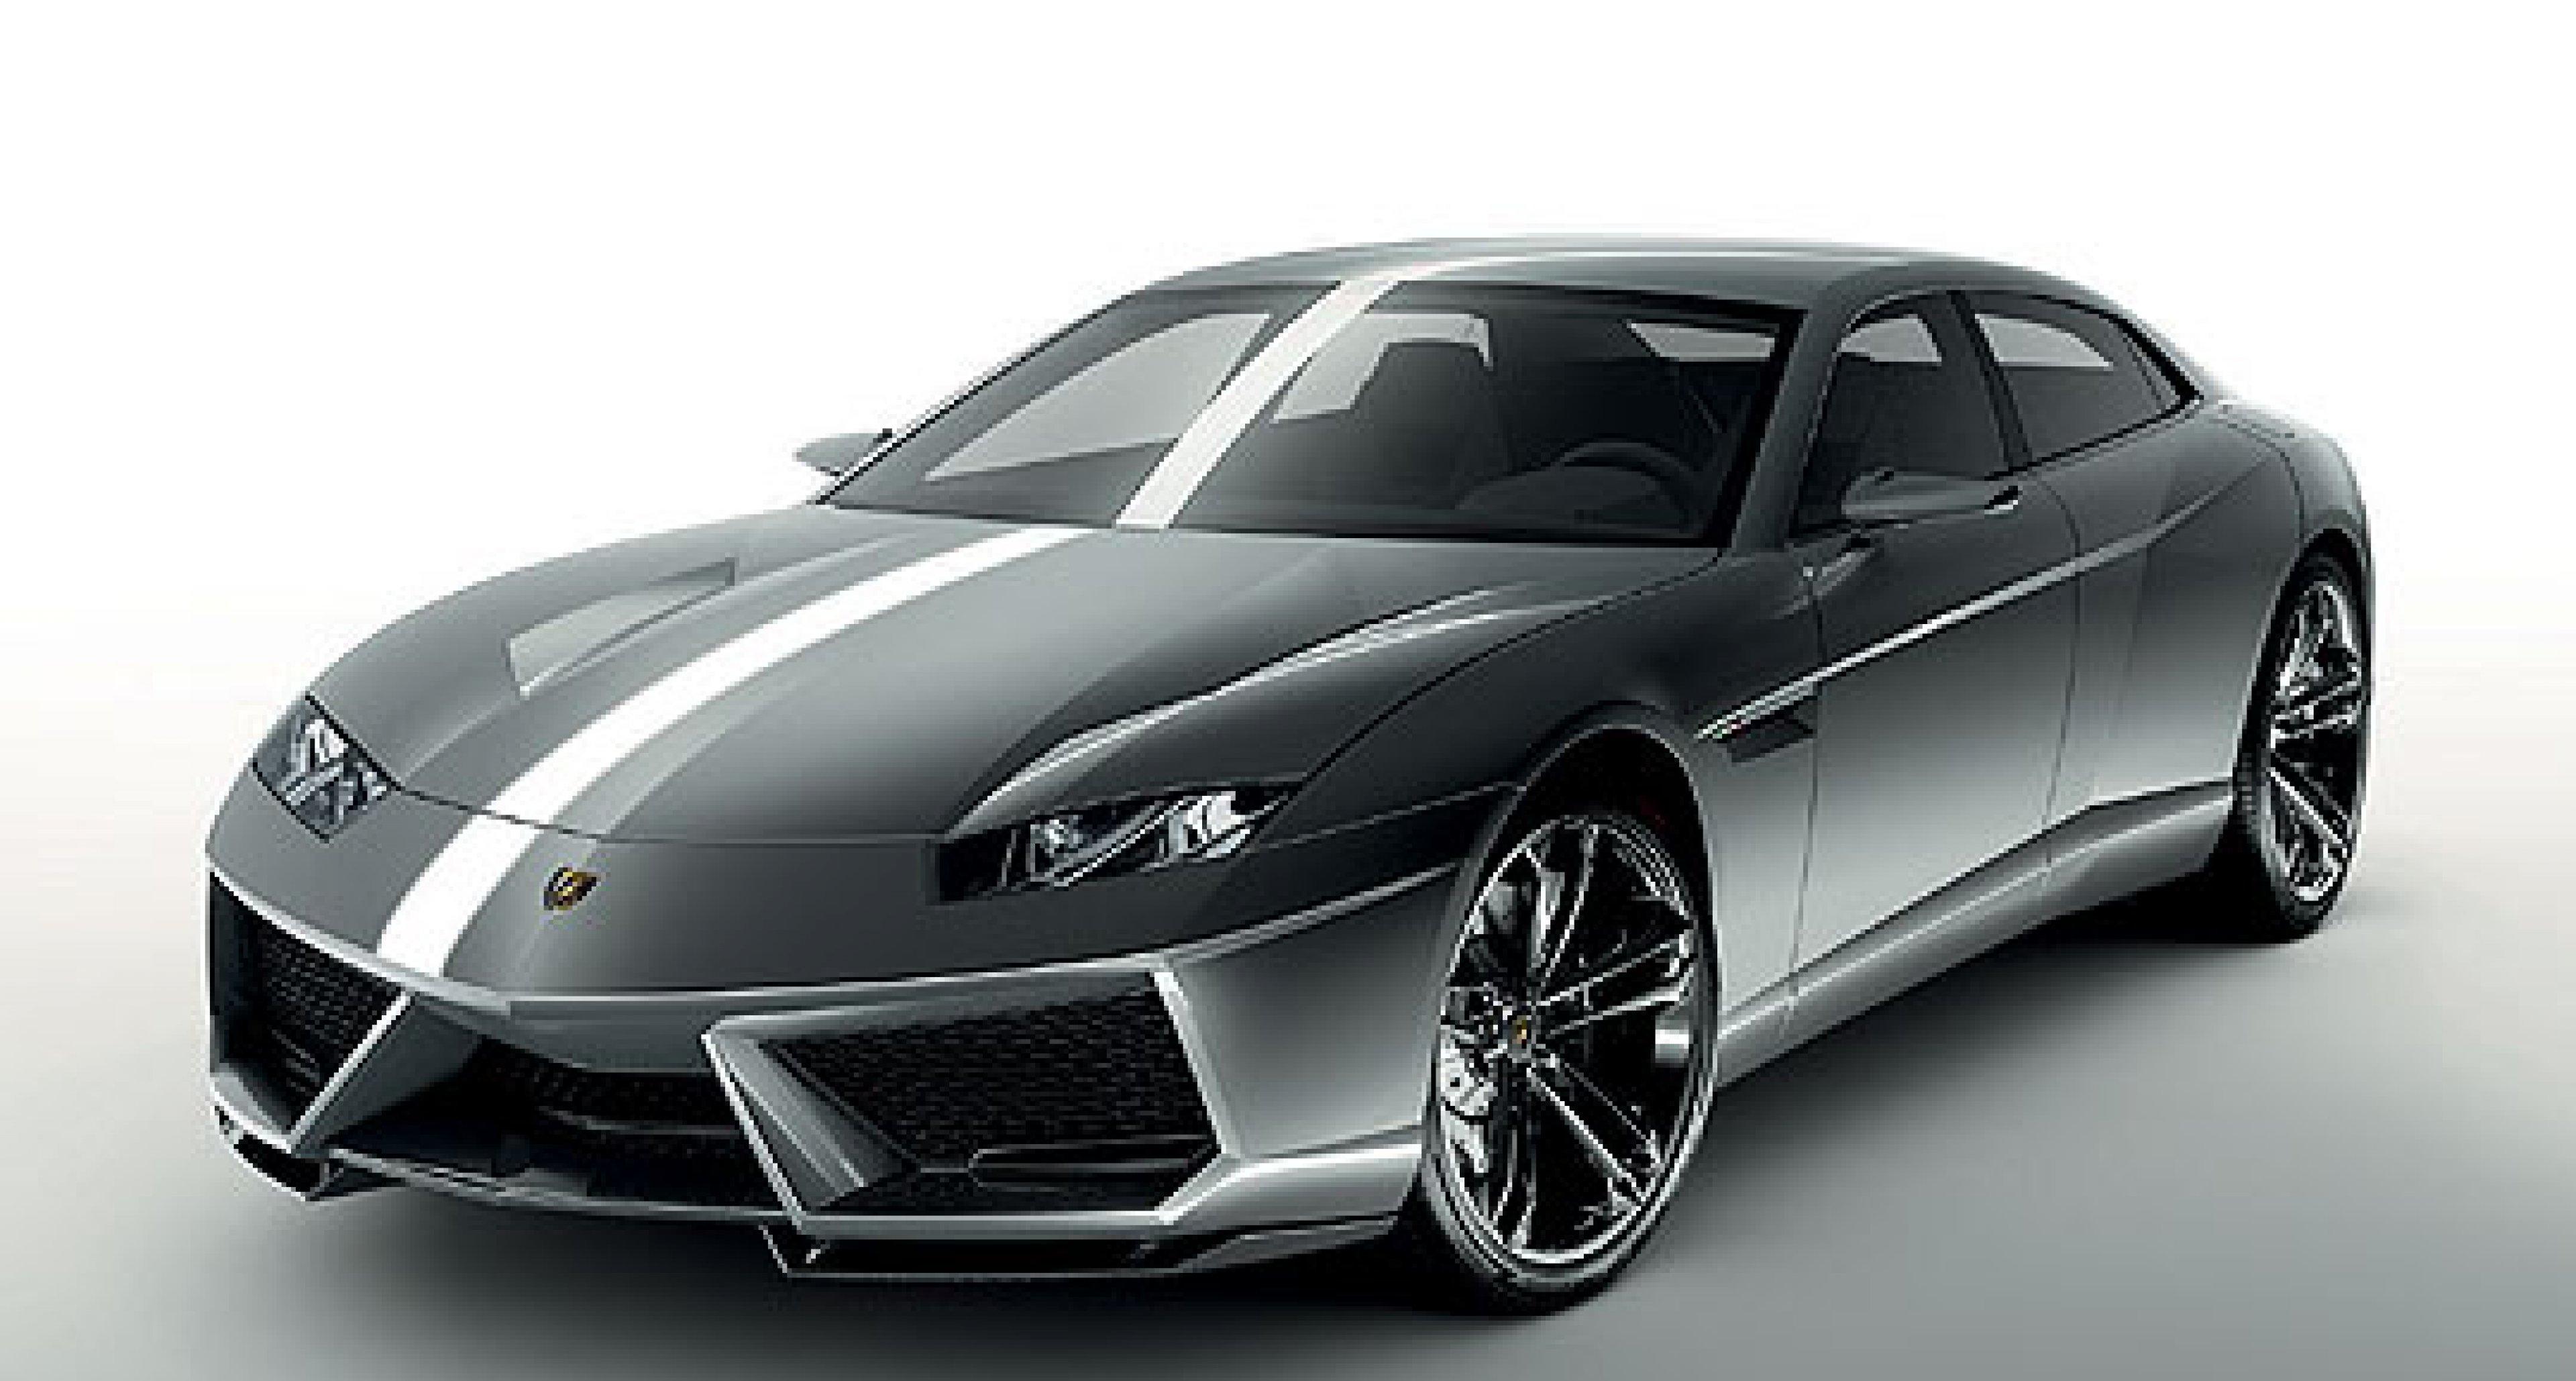 Lamborghini Estoque – No Go for Now